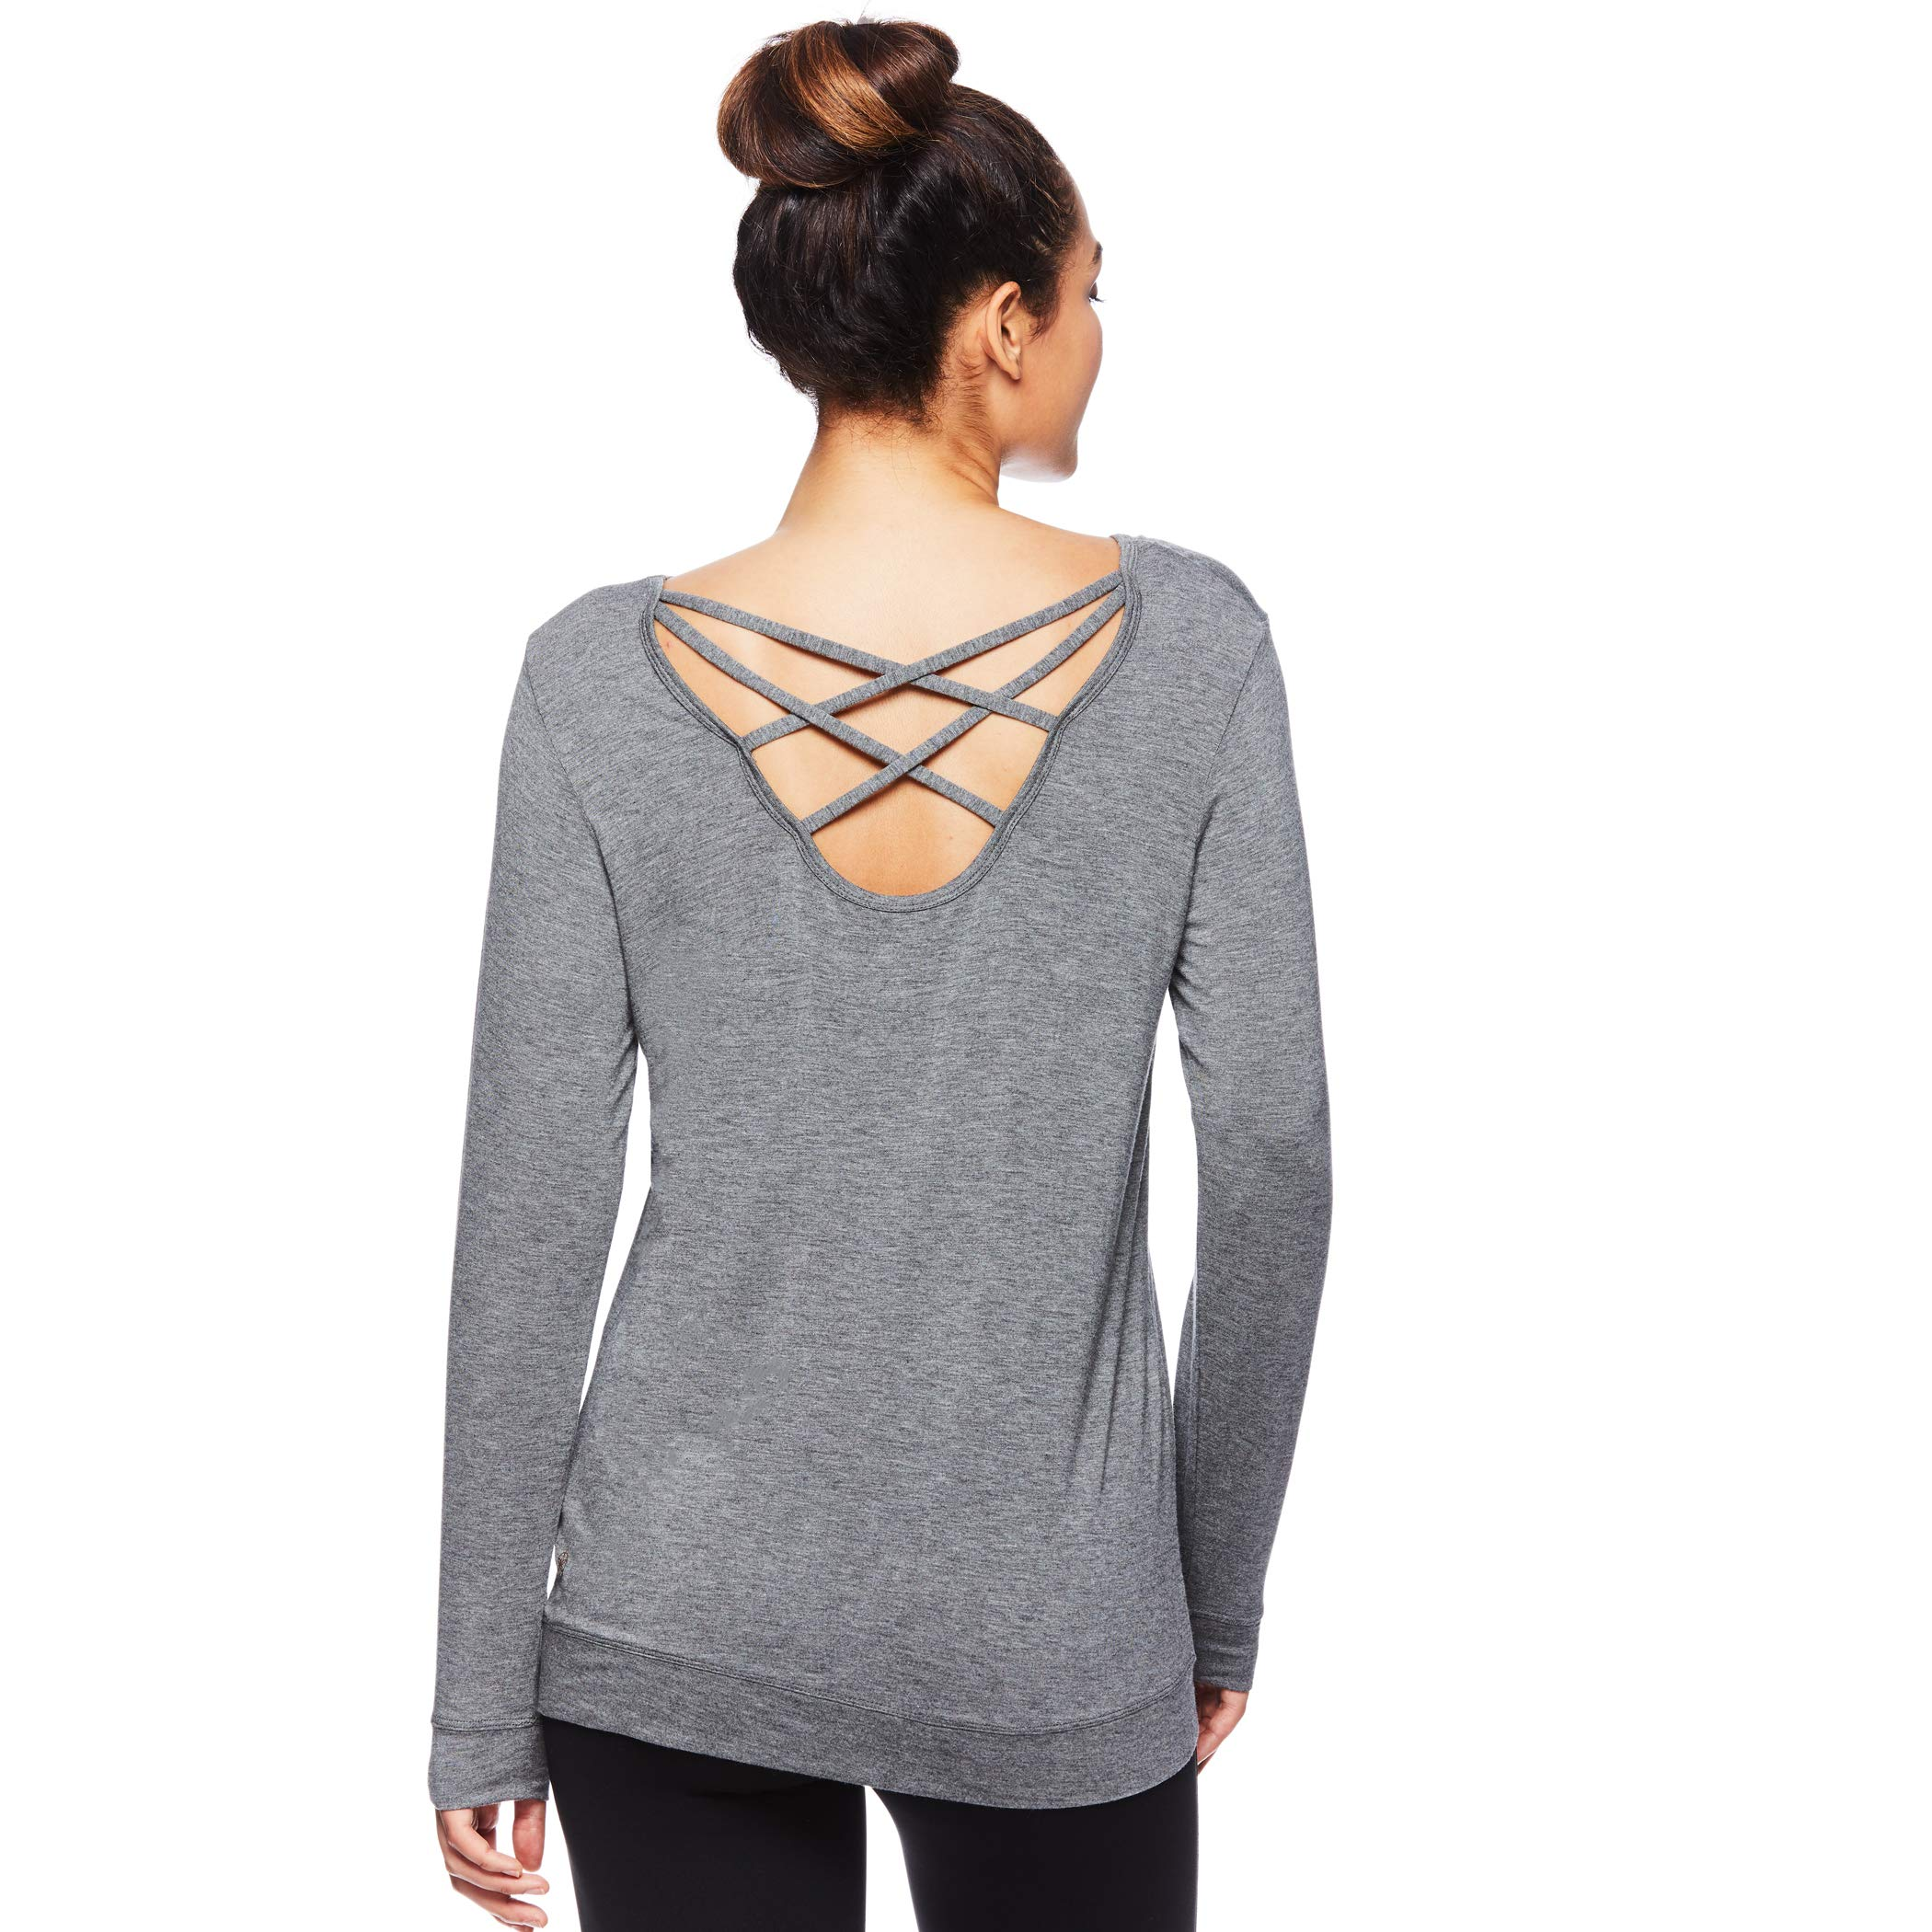 Gaiam Women's Long Sleeve Yoga & Workout T Shirt - Activewear Top w/Open Back Detail - Emma Flint Grey Heather, Small by Gaiam